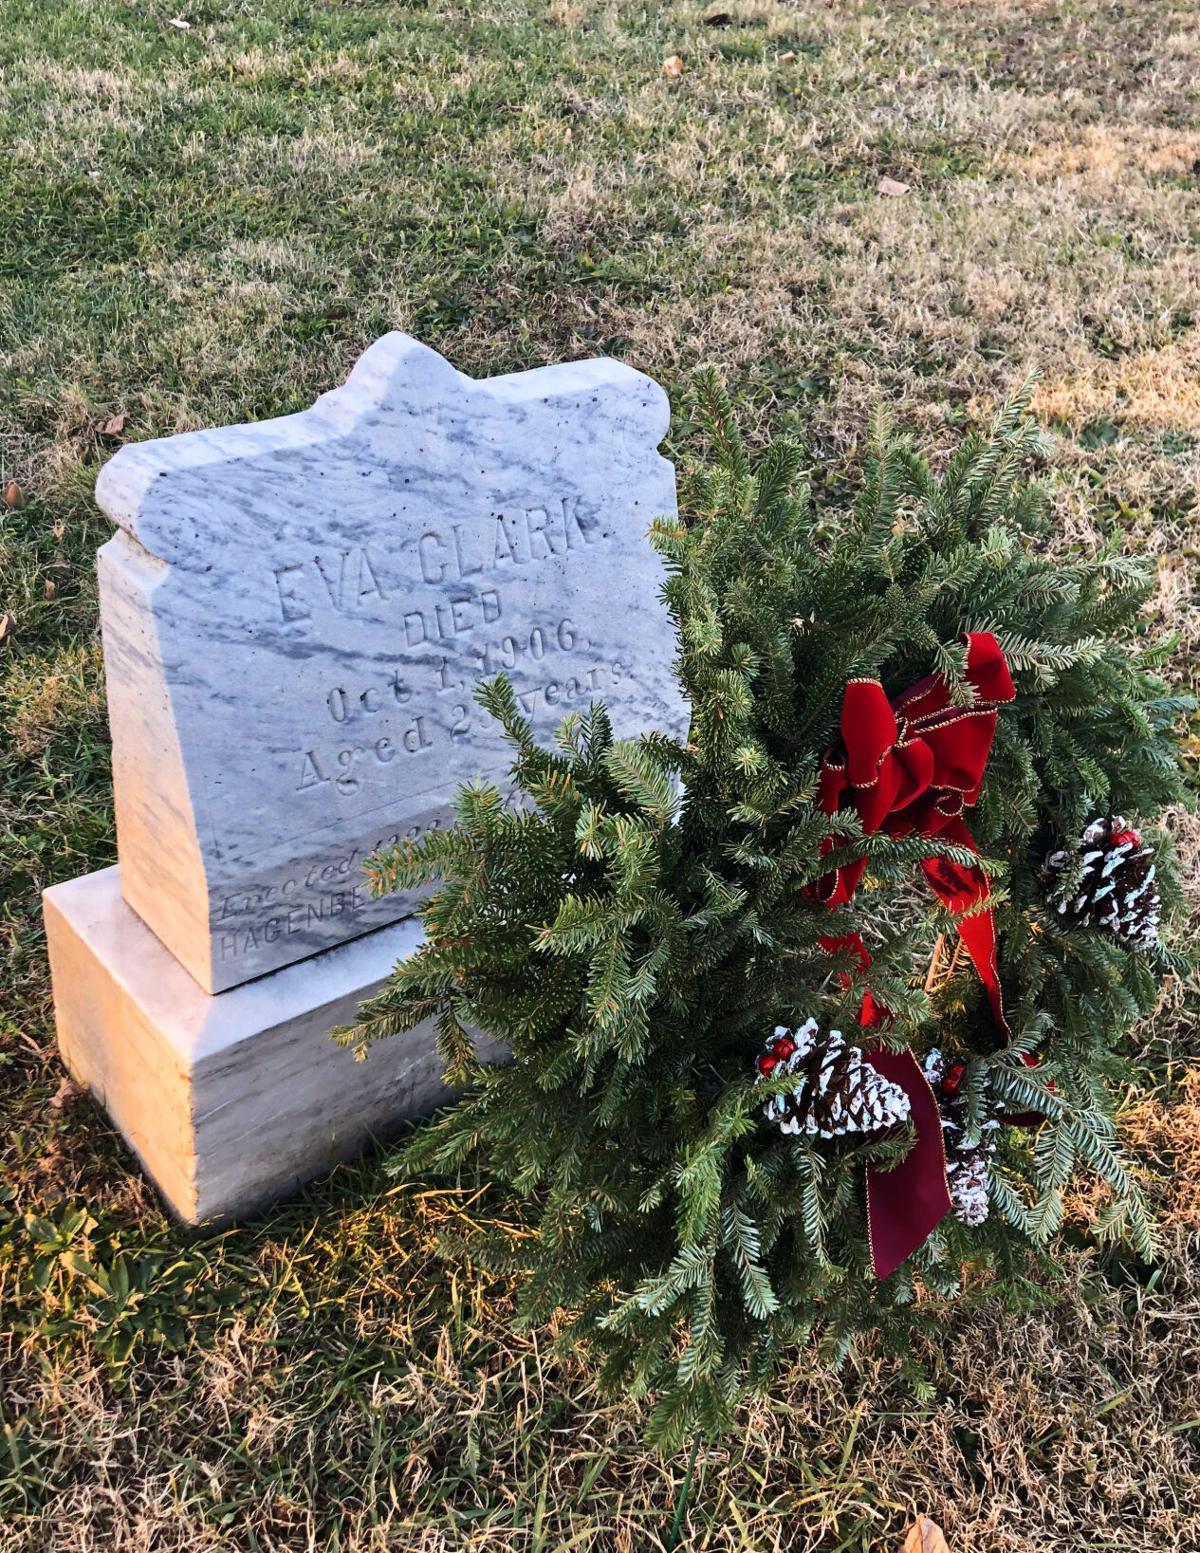 Eva Clark grave